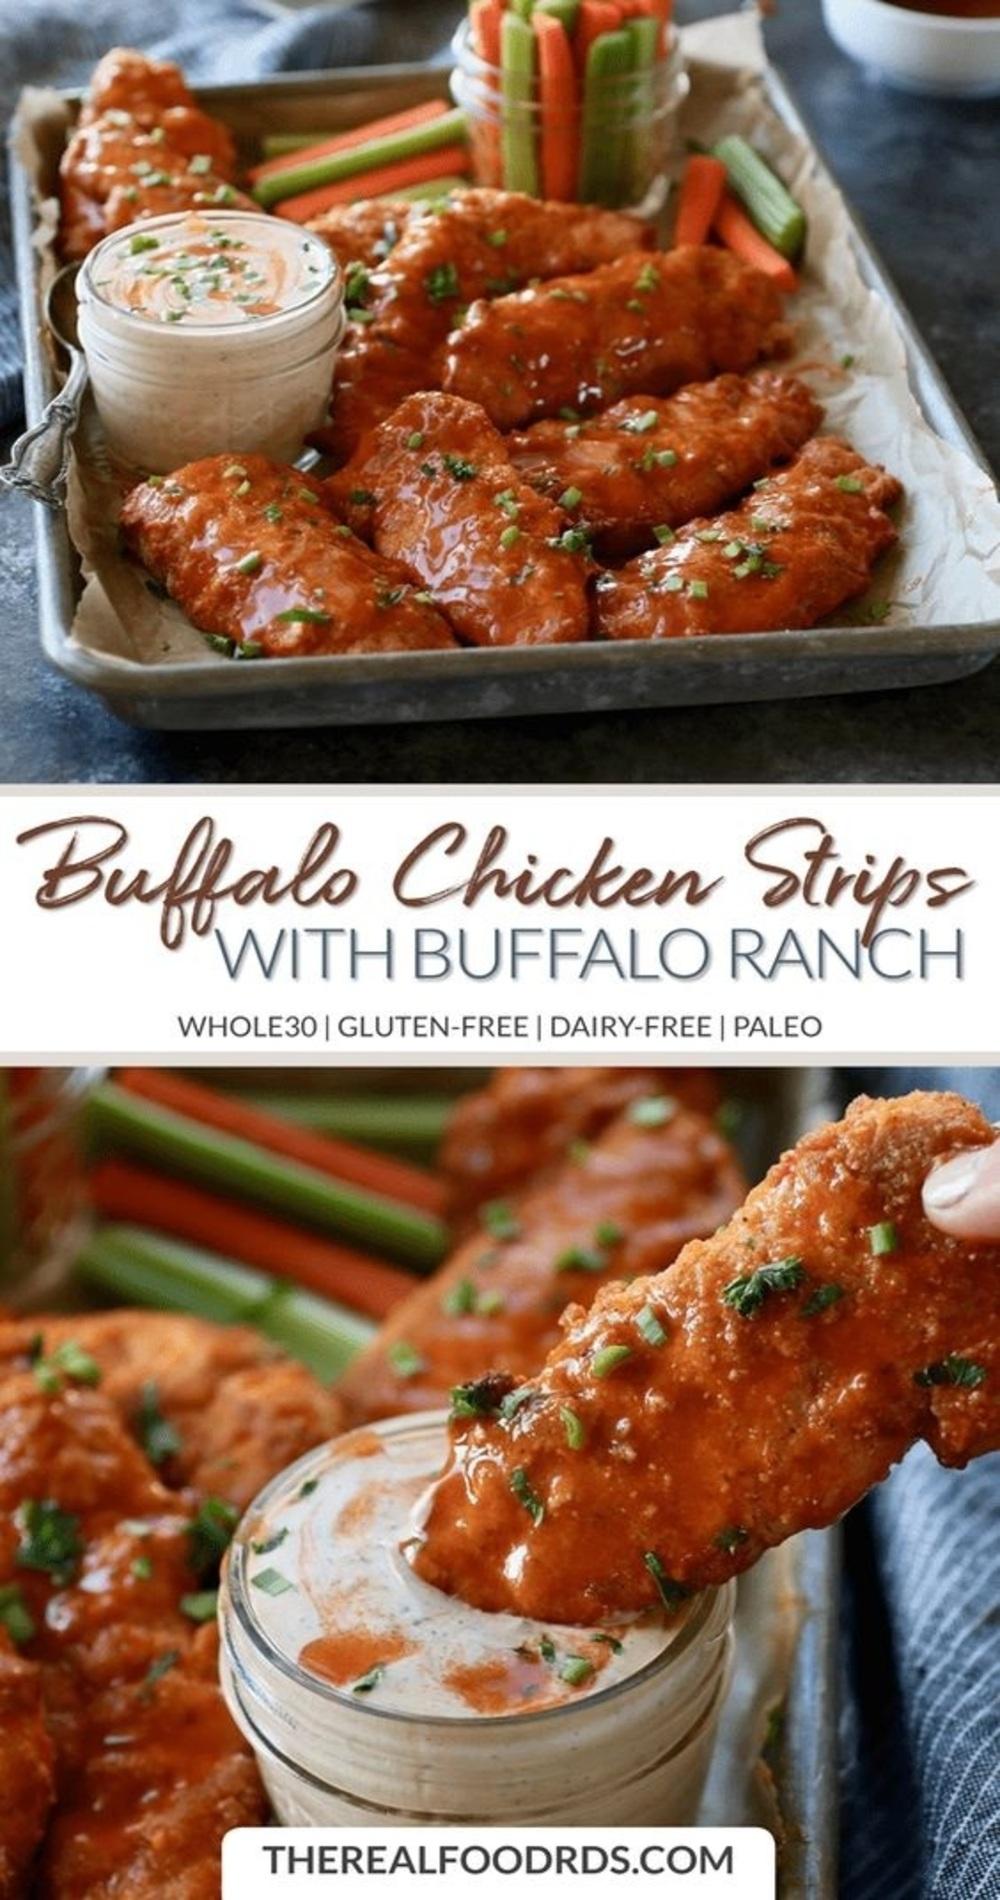 Buffalo Chicken Strips with Buffalo Ranch